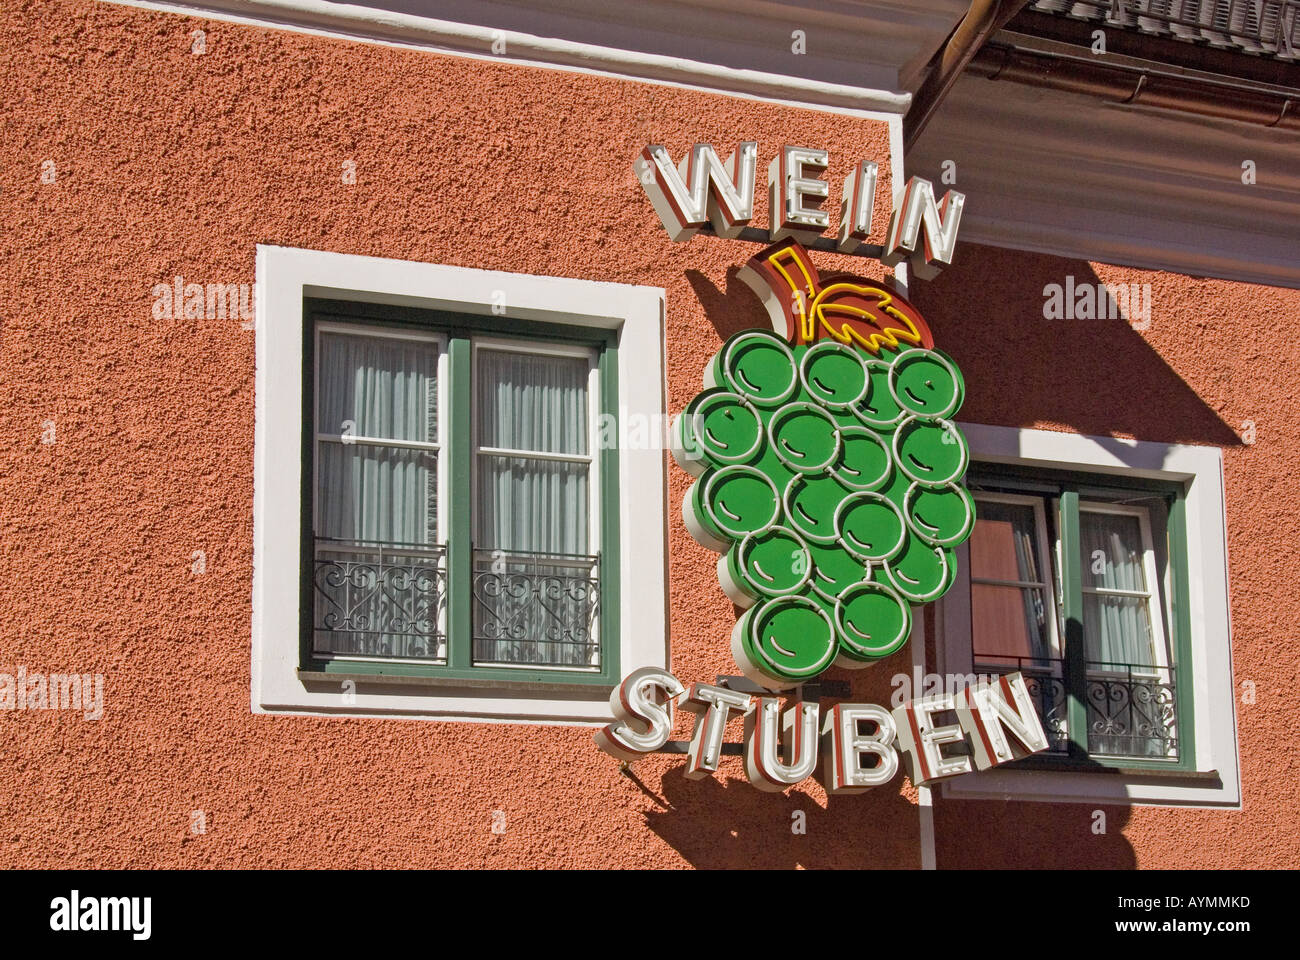 Großzügig Keller Weinbar Bilder - Images for inspirierende Ideen für ...